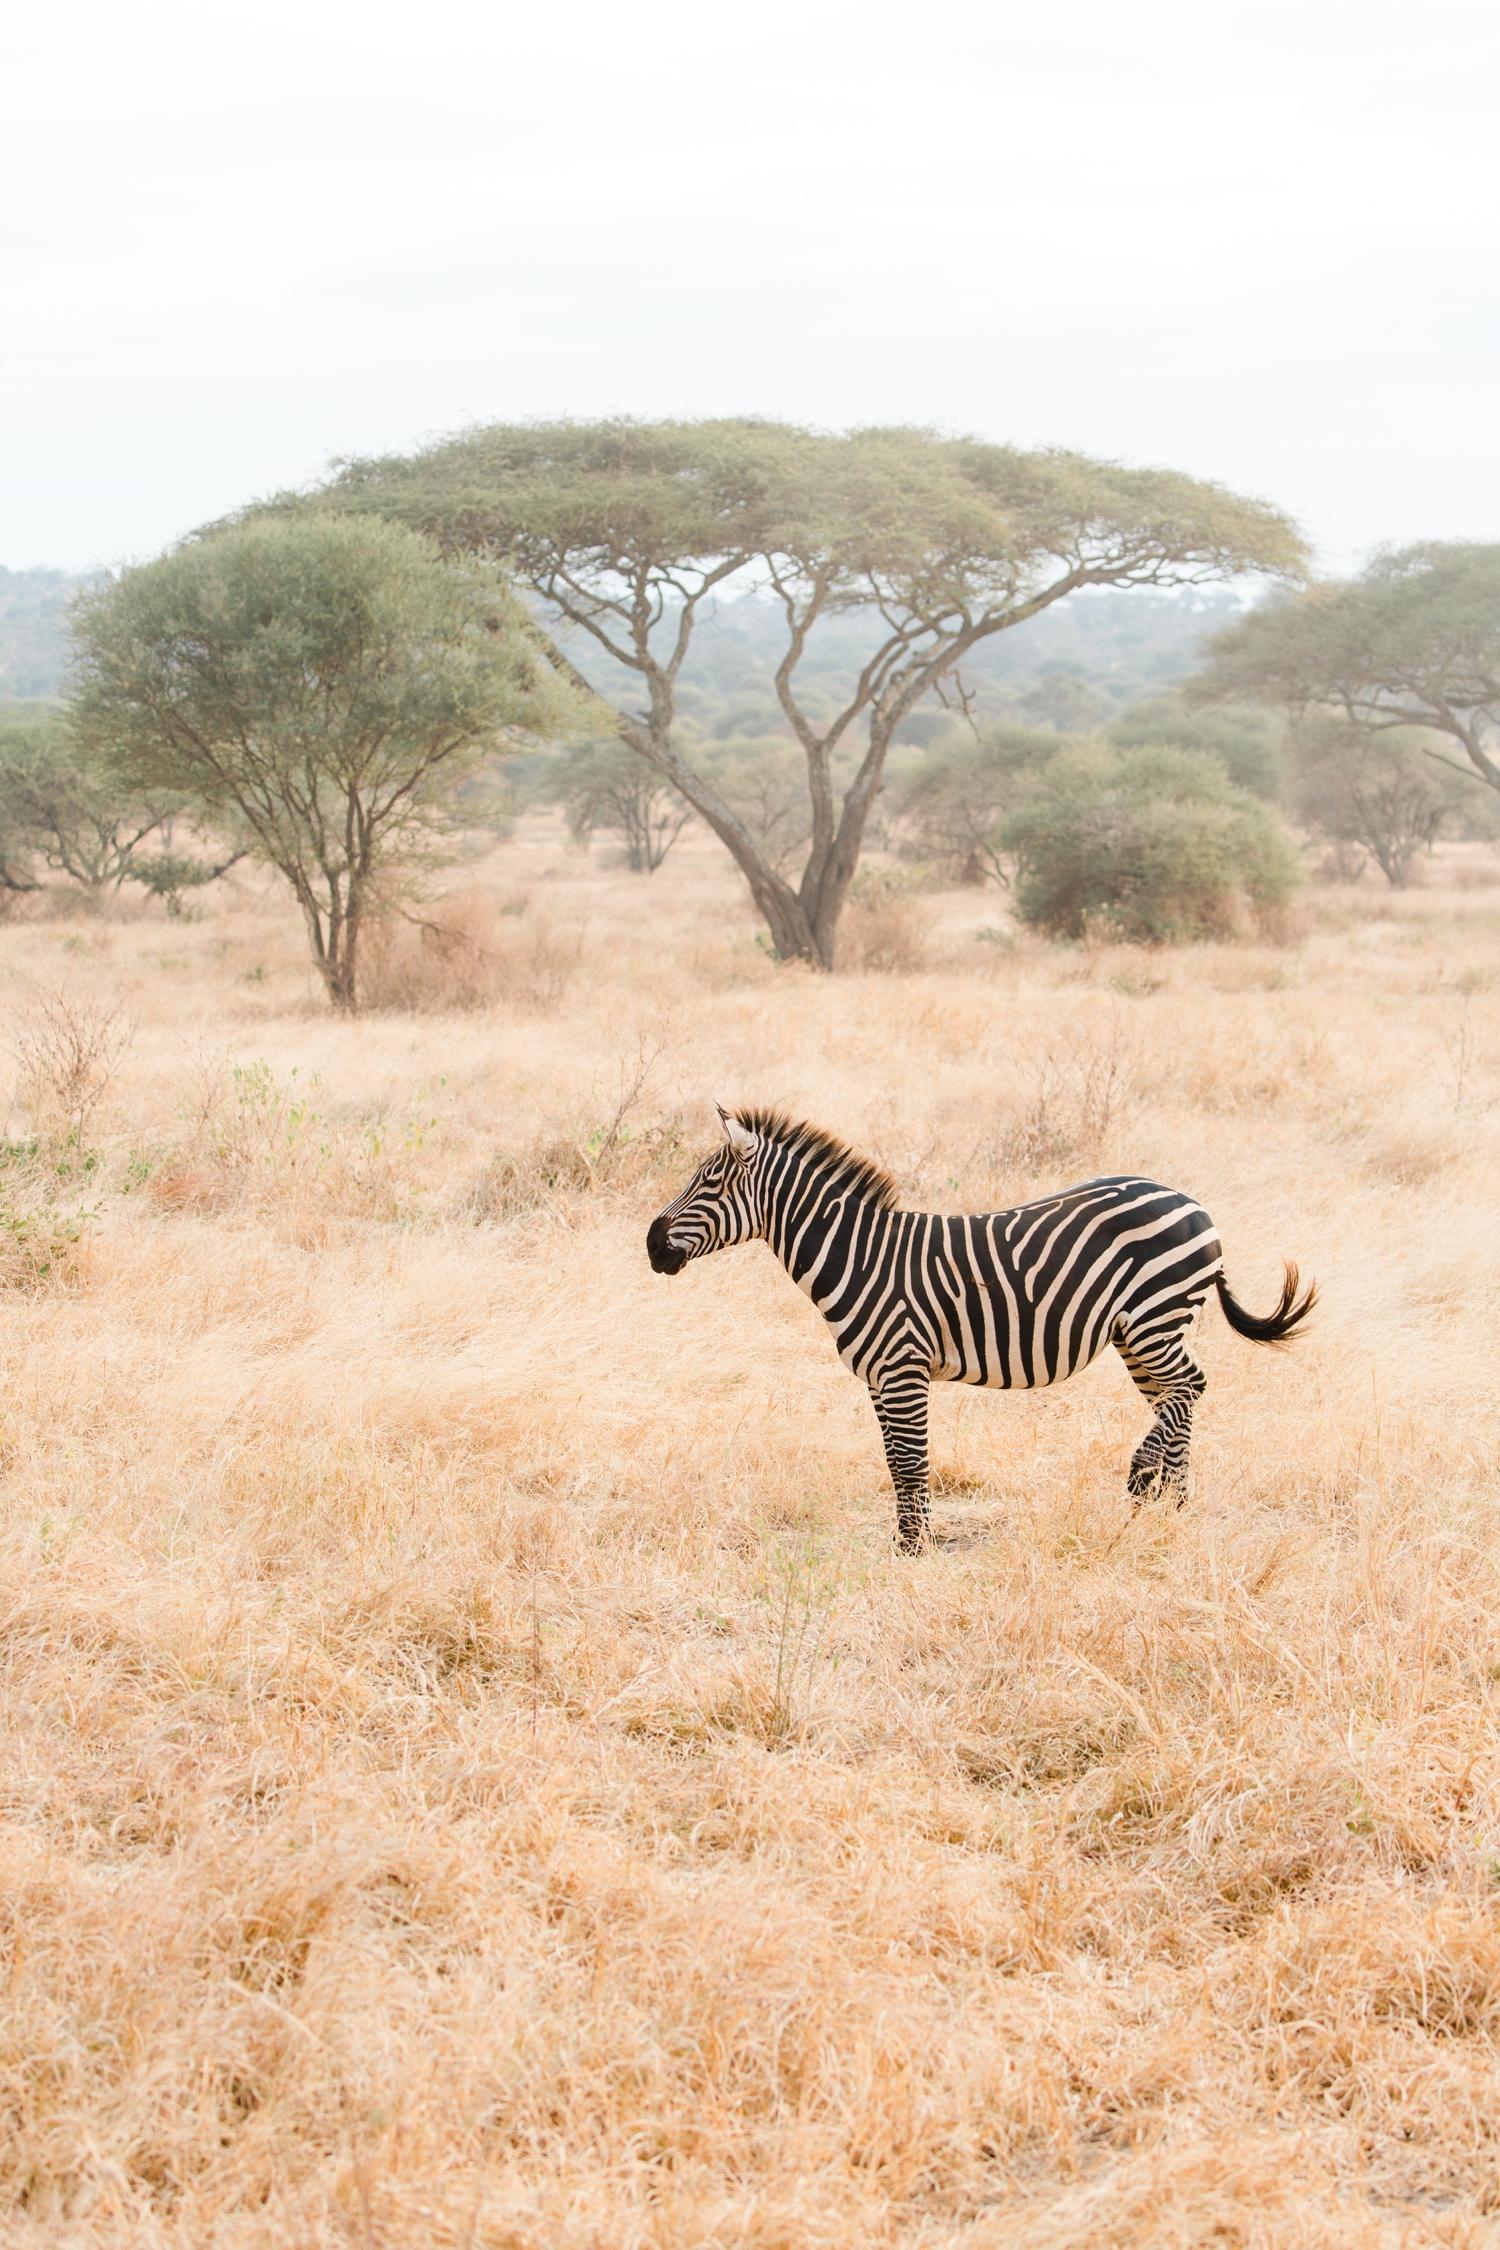 cameron-zegers-travel-photographer-tanzania-seattle.jpg